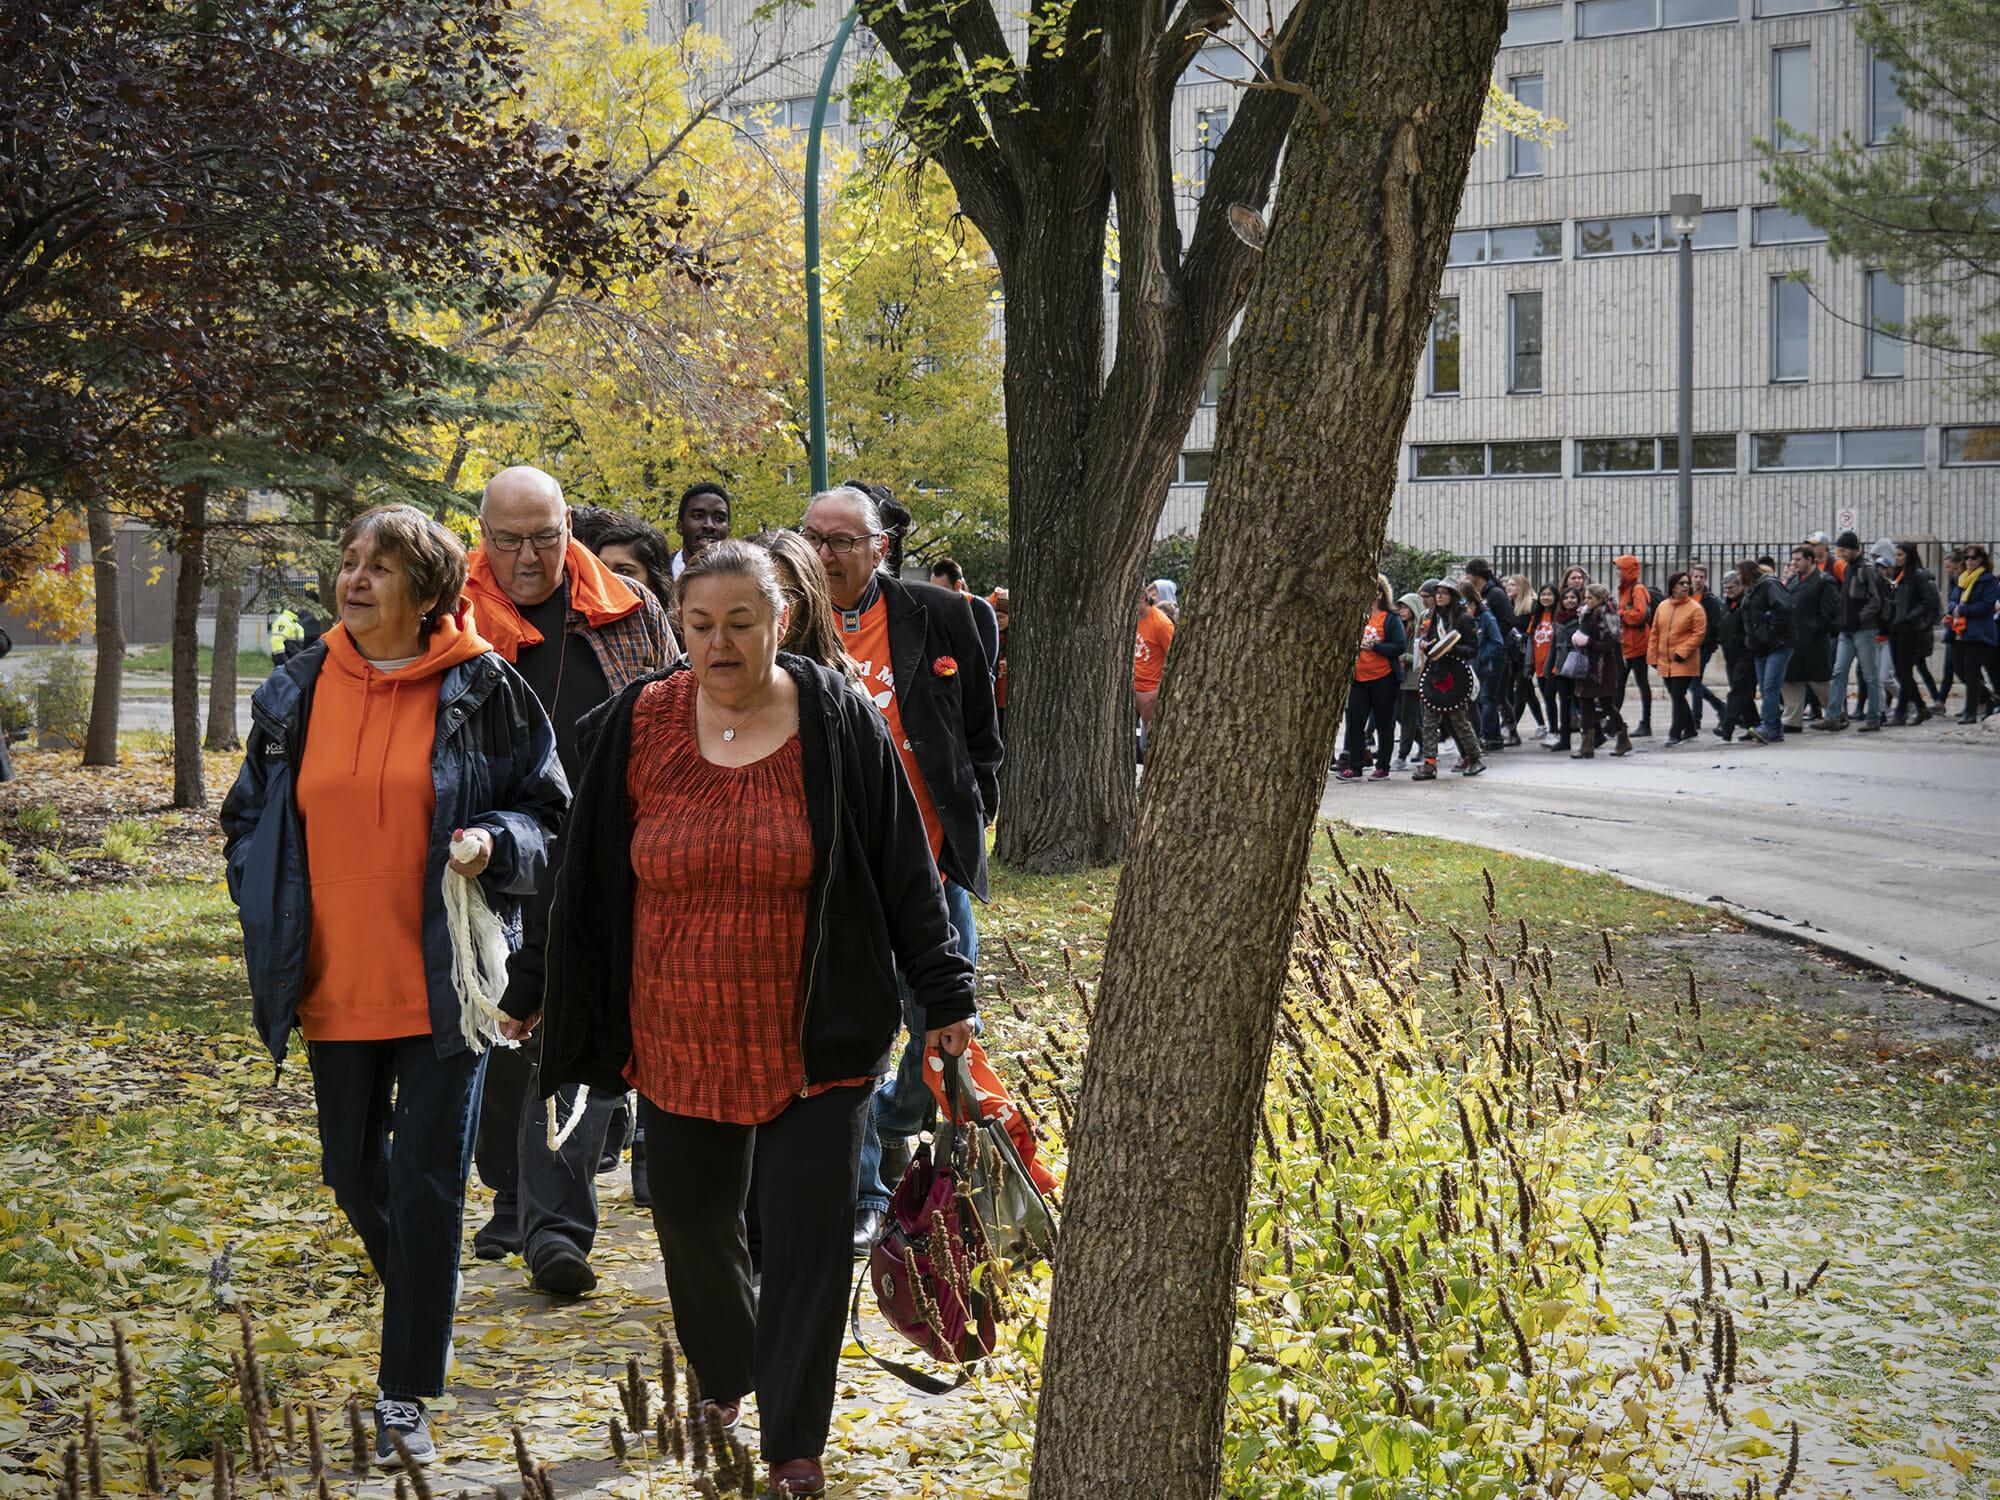 People participating in Orange Shirt Day nurses walk